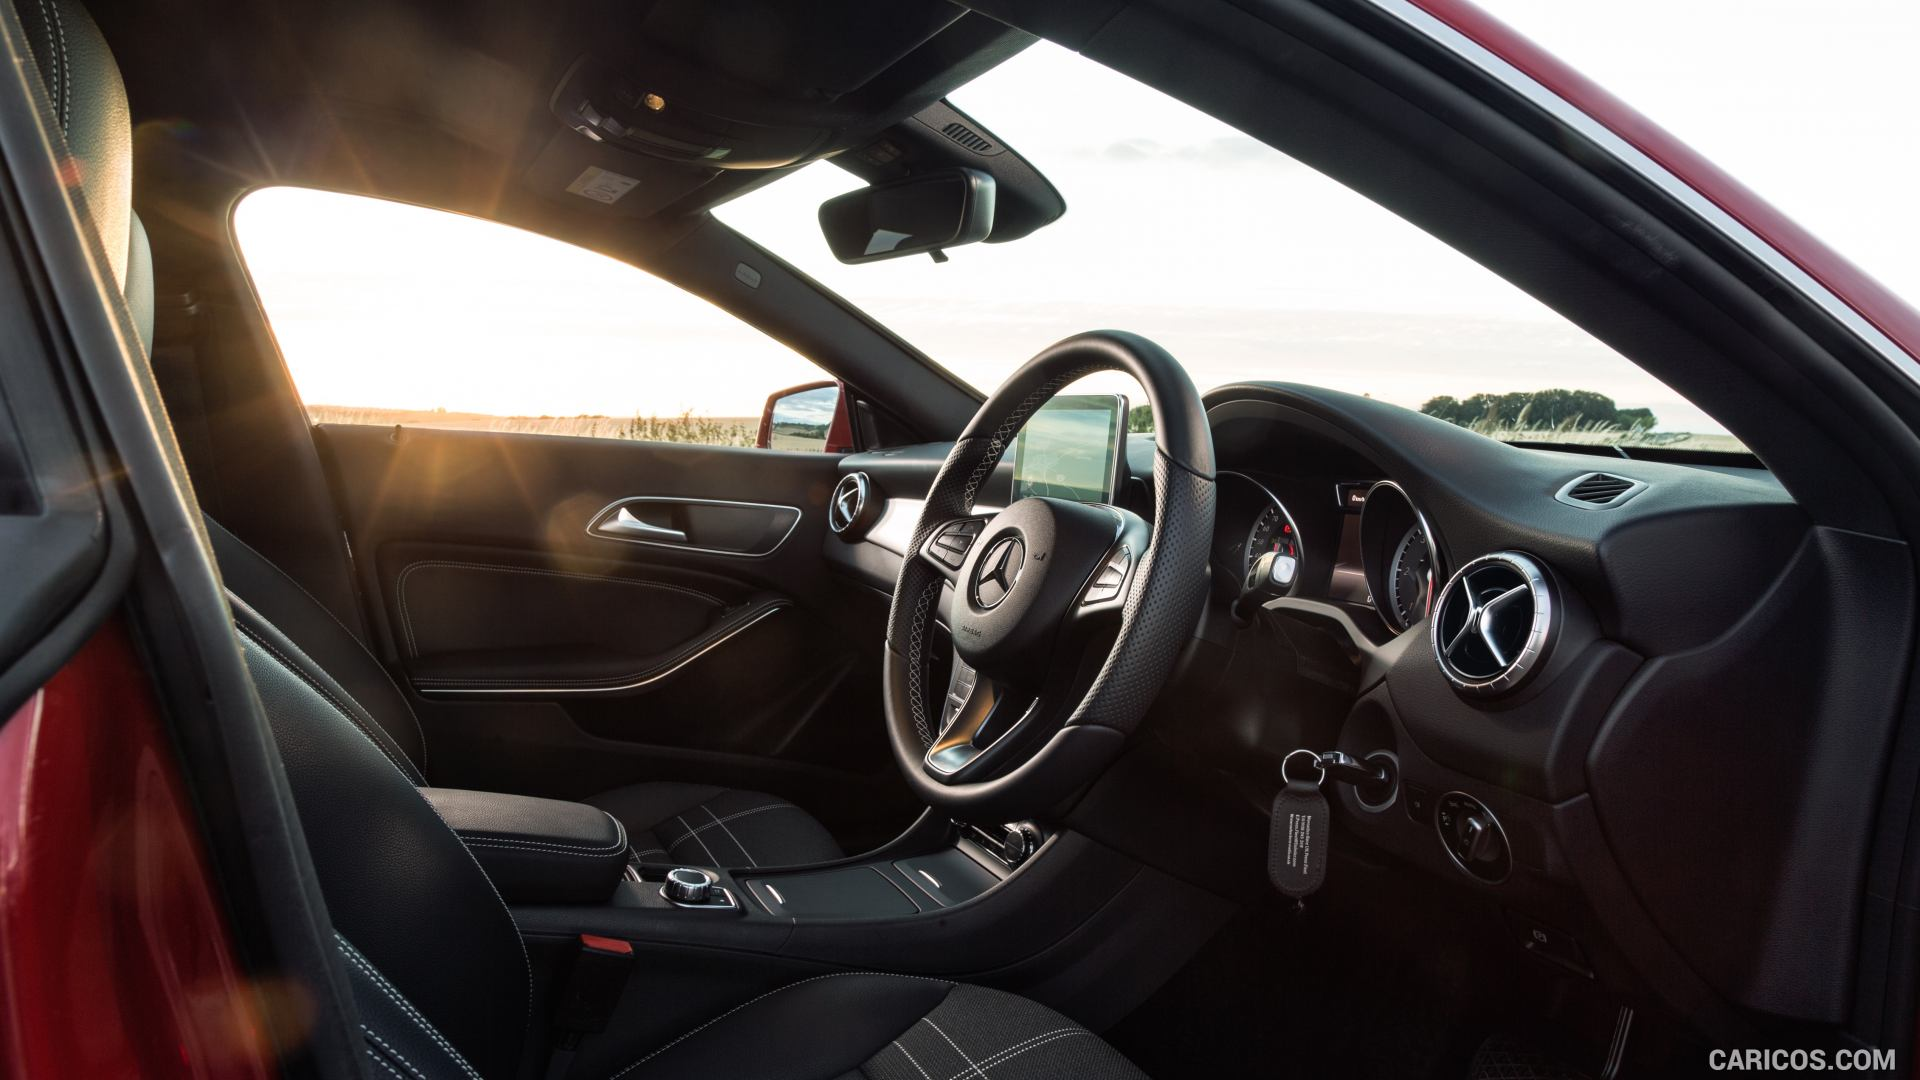 2015 Mercedes Benz CLA 200 CDI Shooting Brake UK Spec   Interior 1920x1080